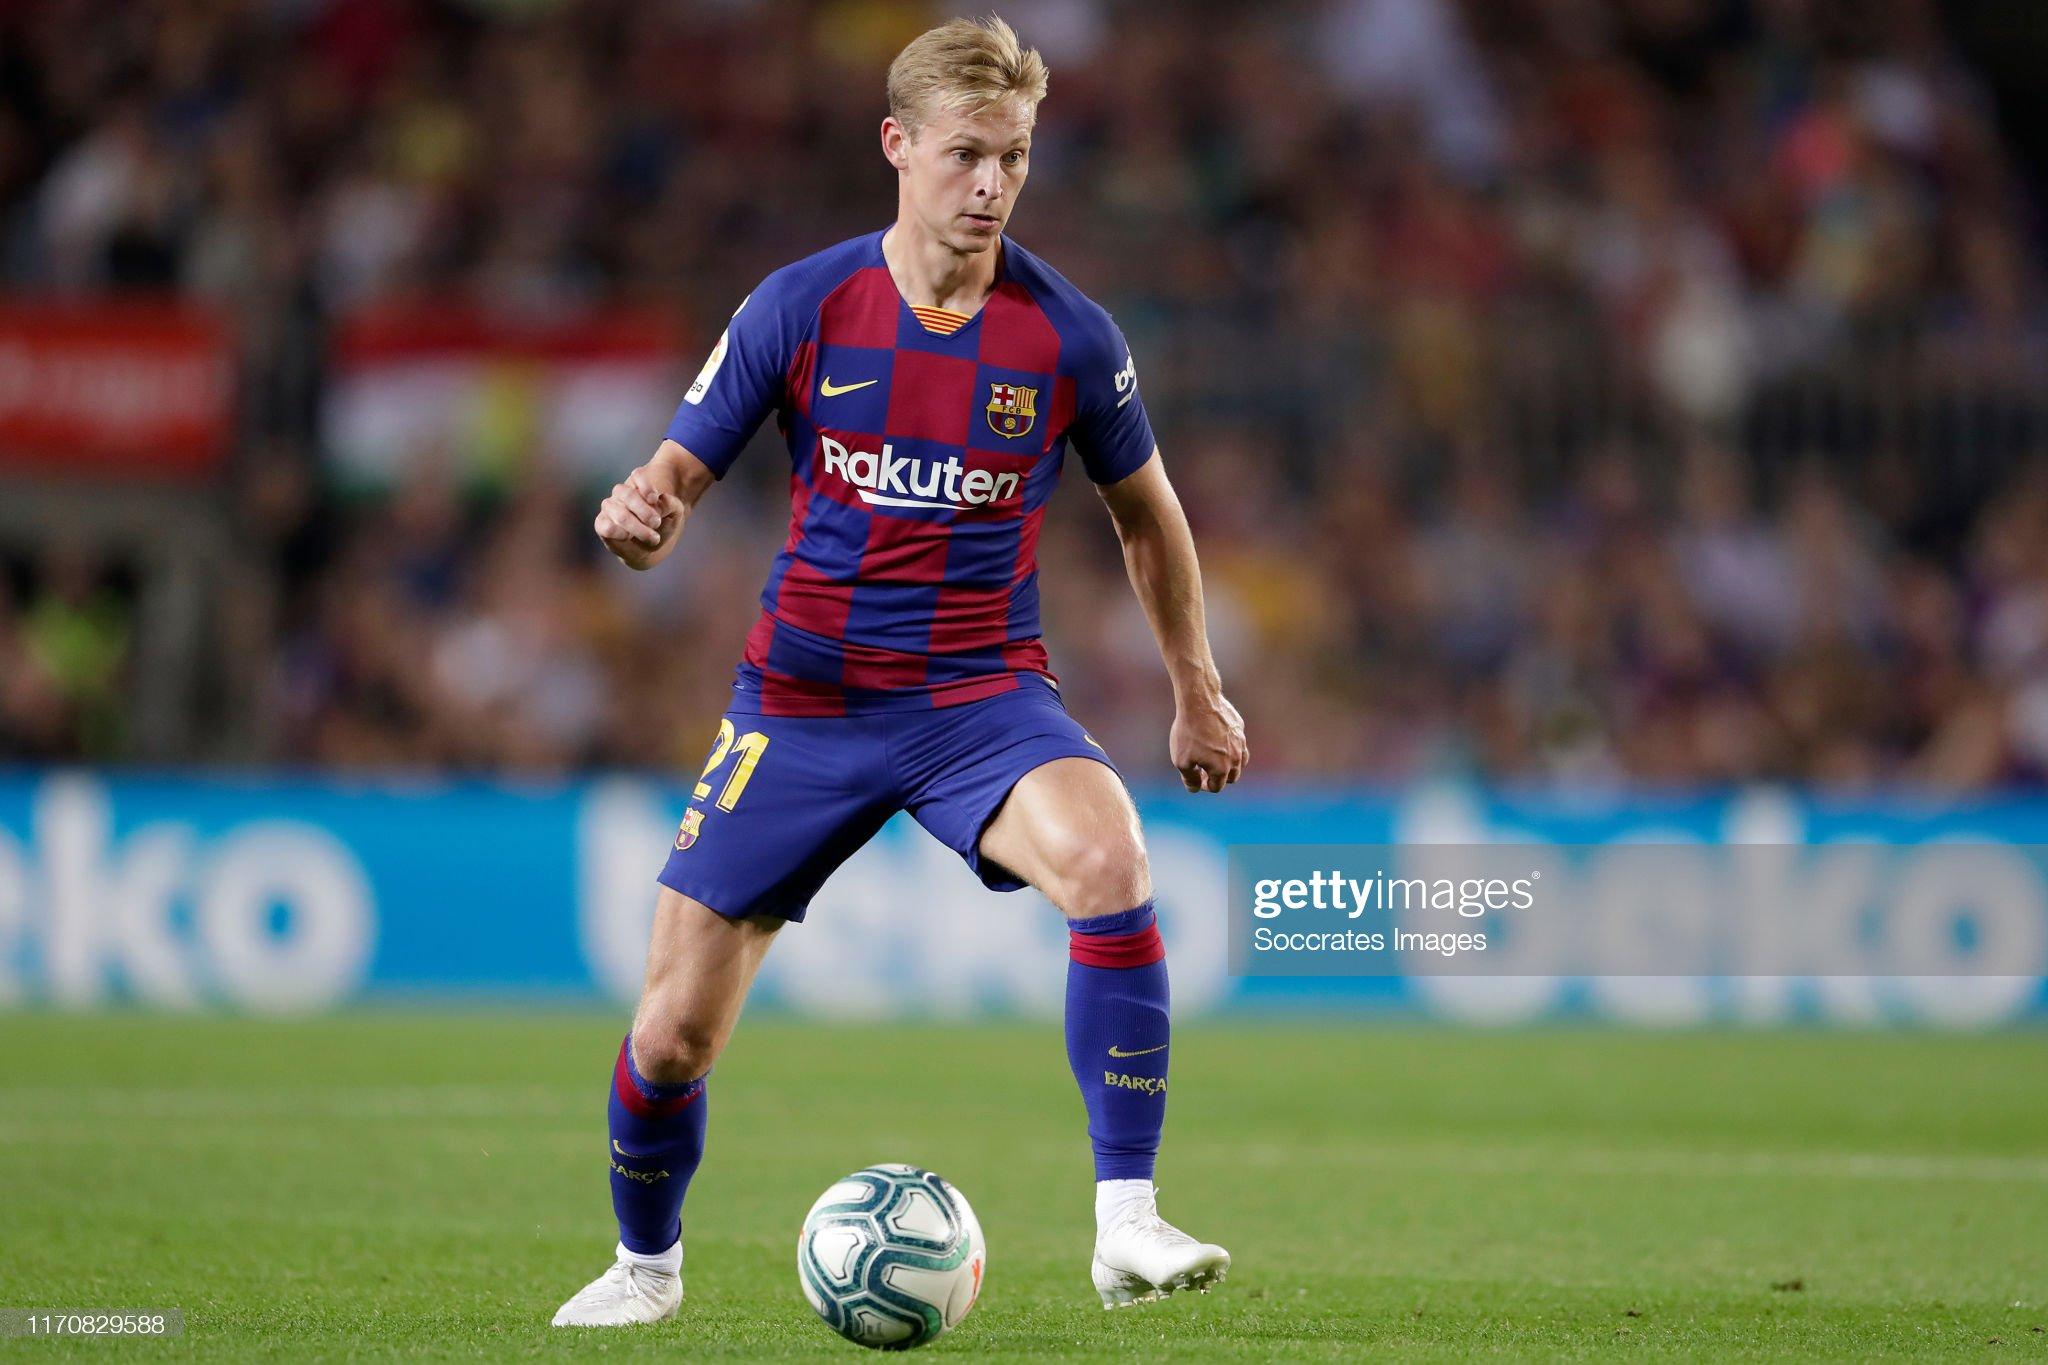 صور مباراة : برشلونة - فياريال 2-1 ( 24-09-2019 )  Frenkie-de-jong-of-fc-barcelona-during-the-la-liga-santander-match-picture-id1170829588?s=2048x2048